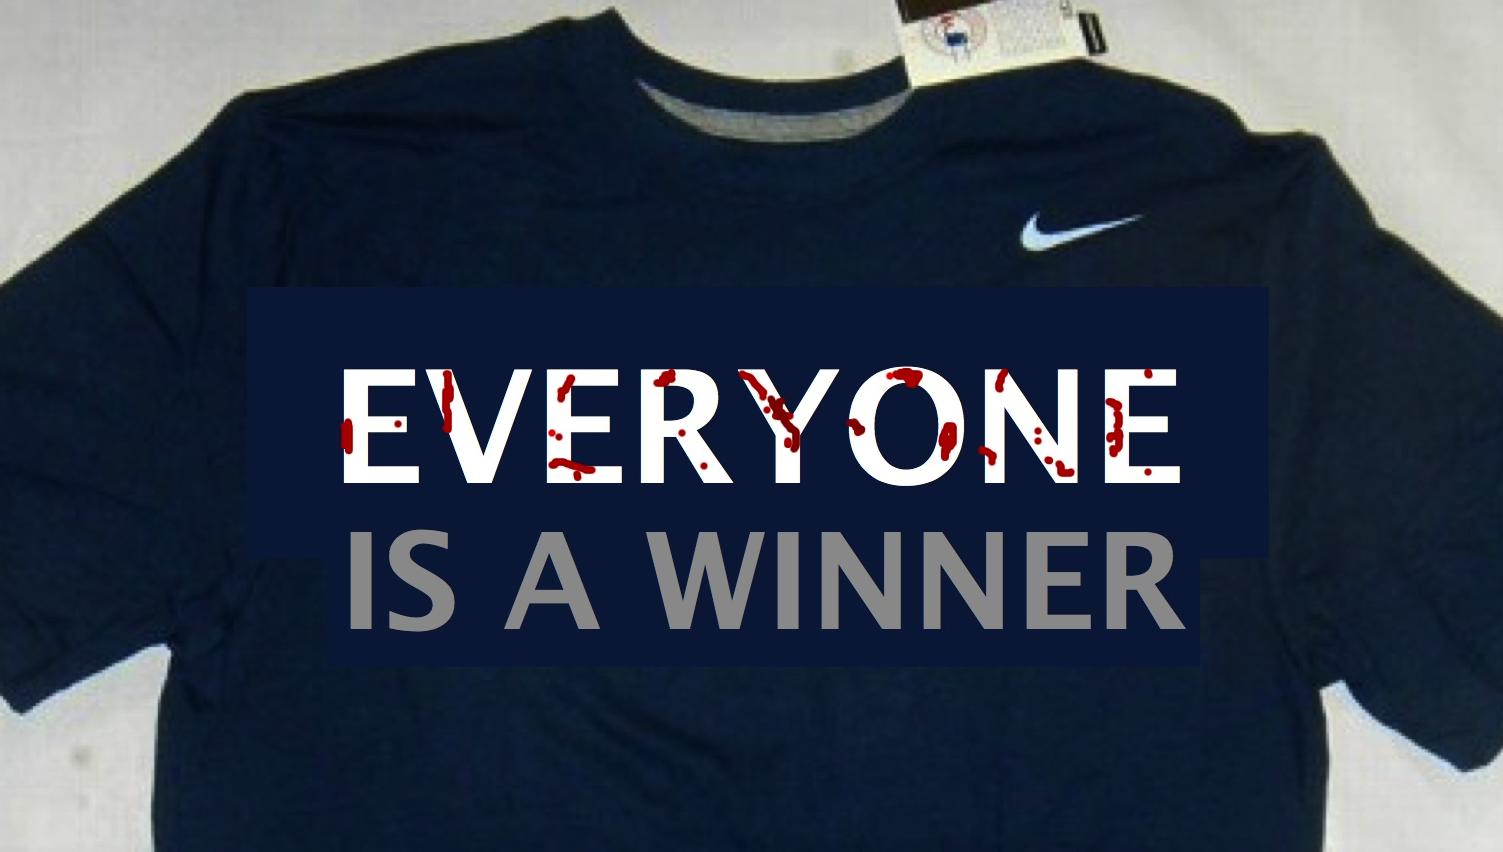 Nike slogans list